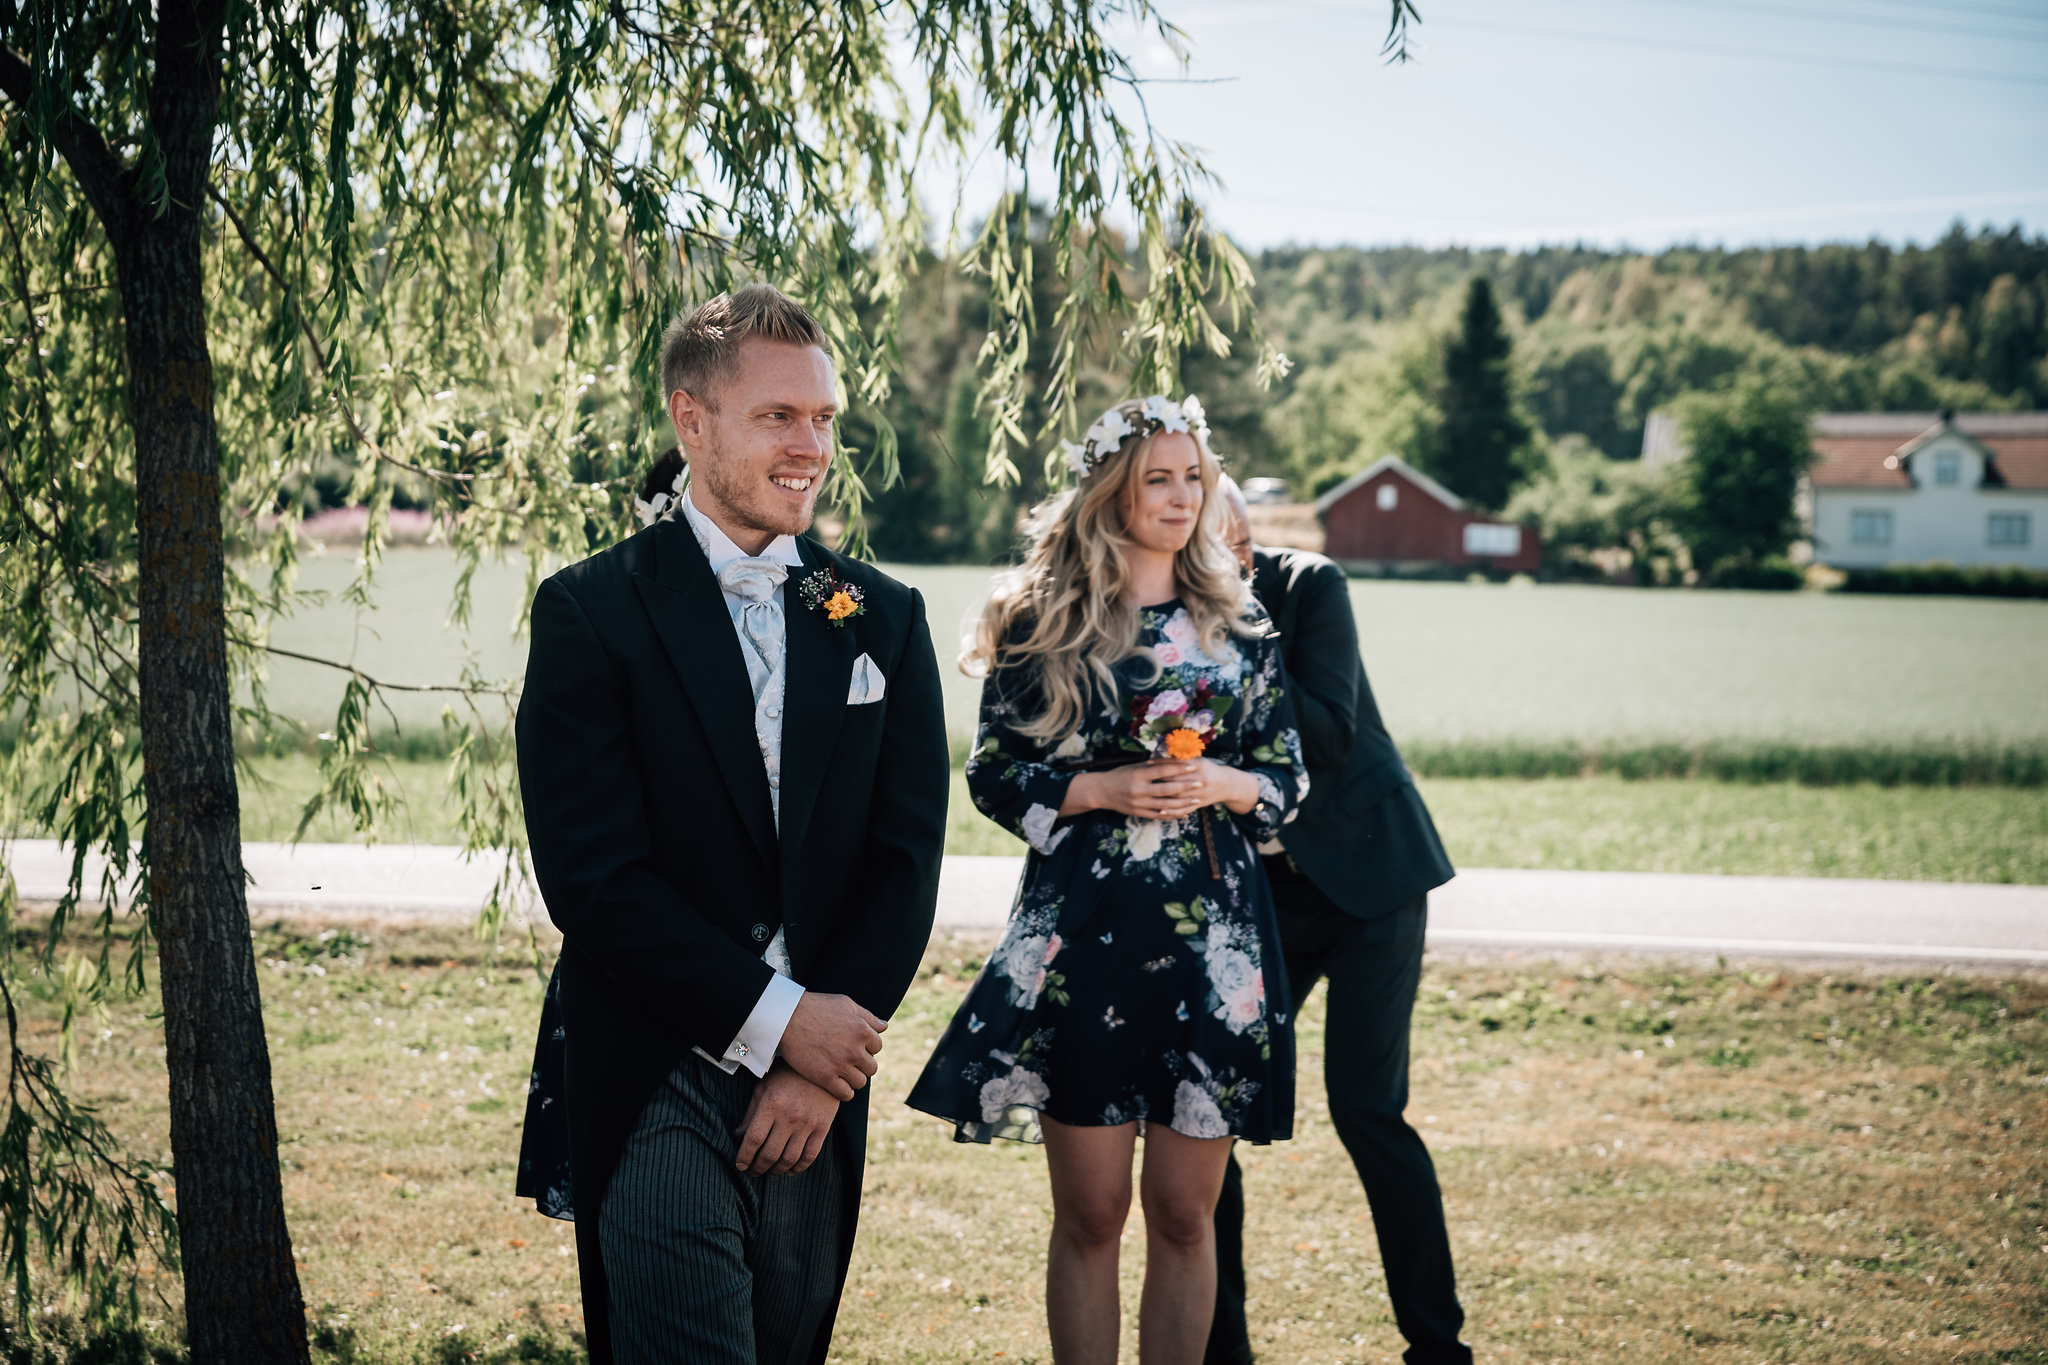 750_3629-fotograf-vestfold-bryllupsfotograf-.jpg